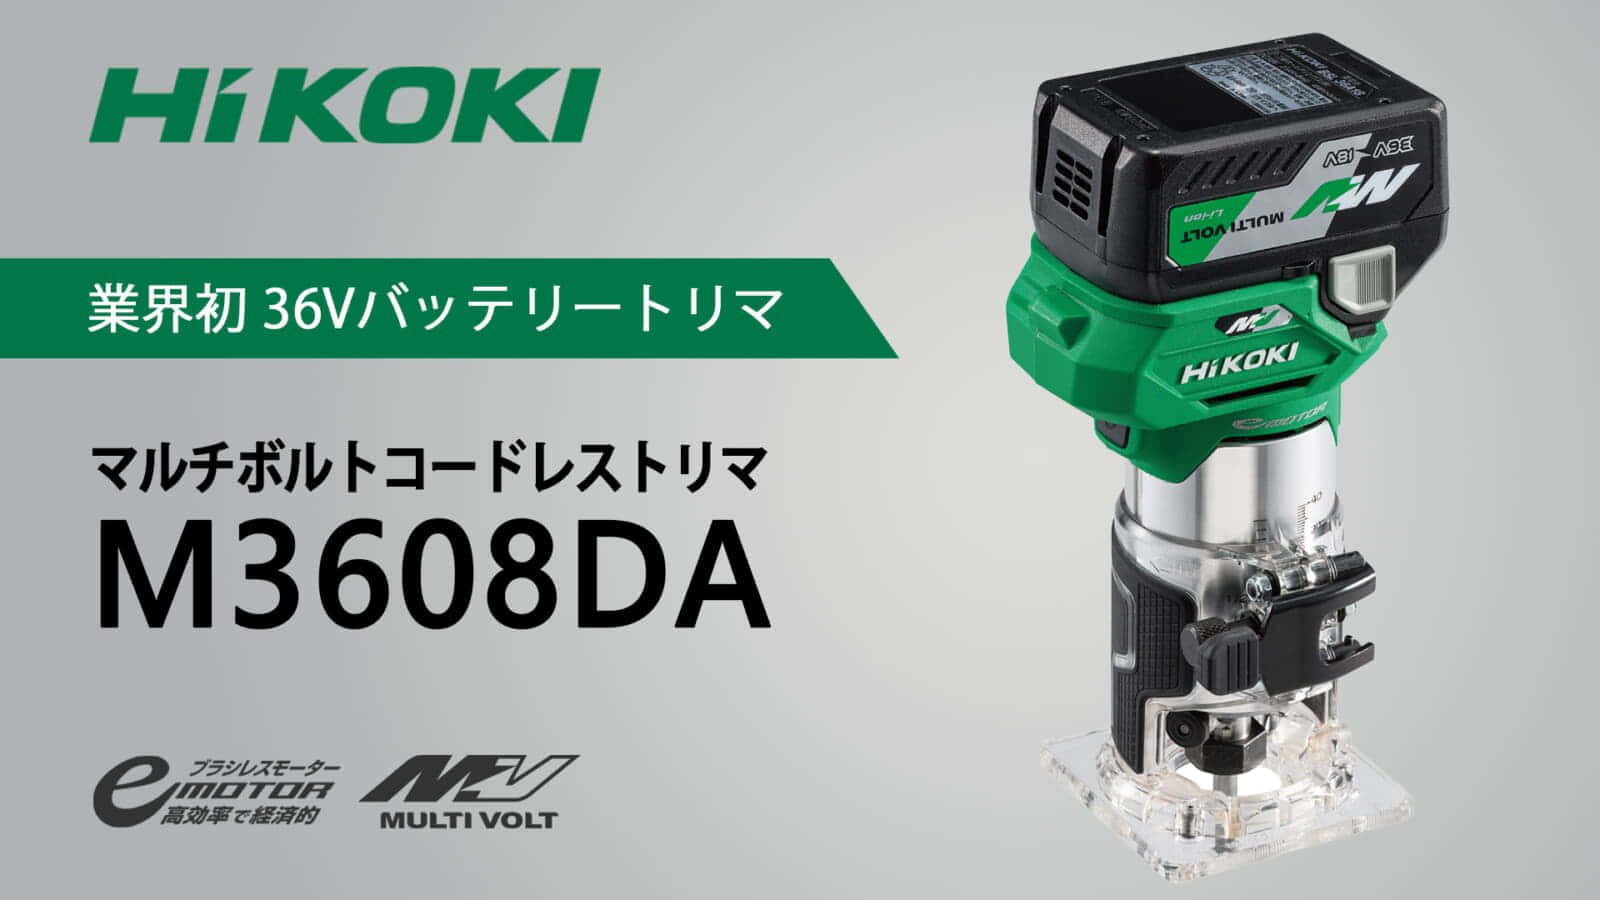 HiKOKI M3608DA コードレストリマを発売、業界初の36Vトリマ